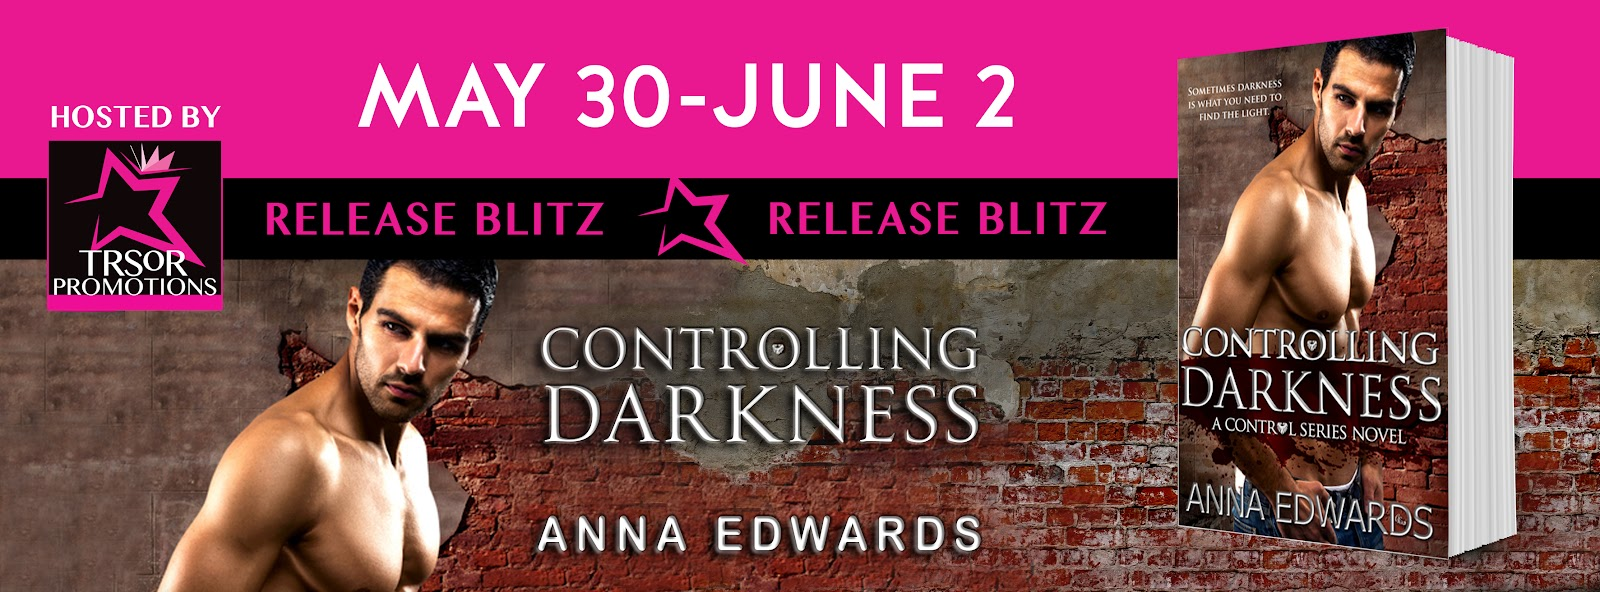 CONTROLLING_DARKNESS_BLITZ.jpg